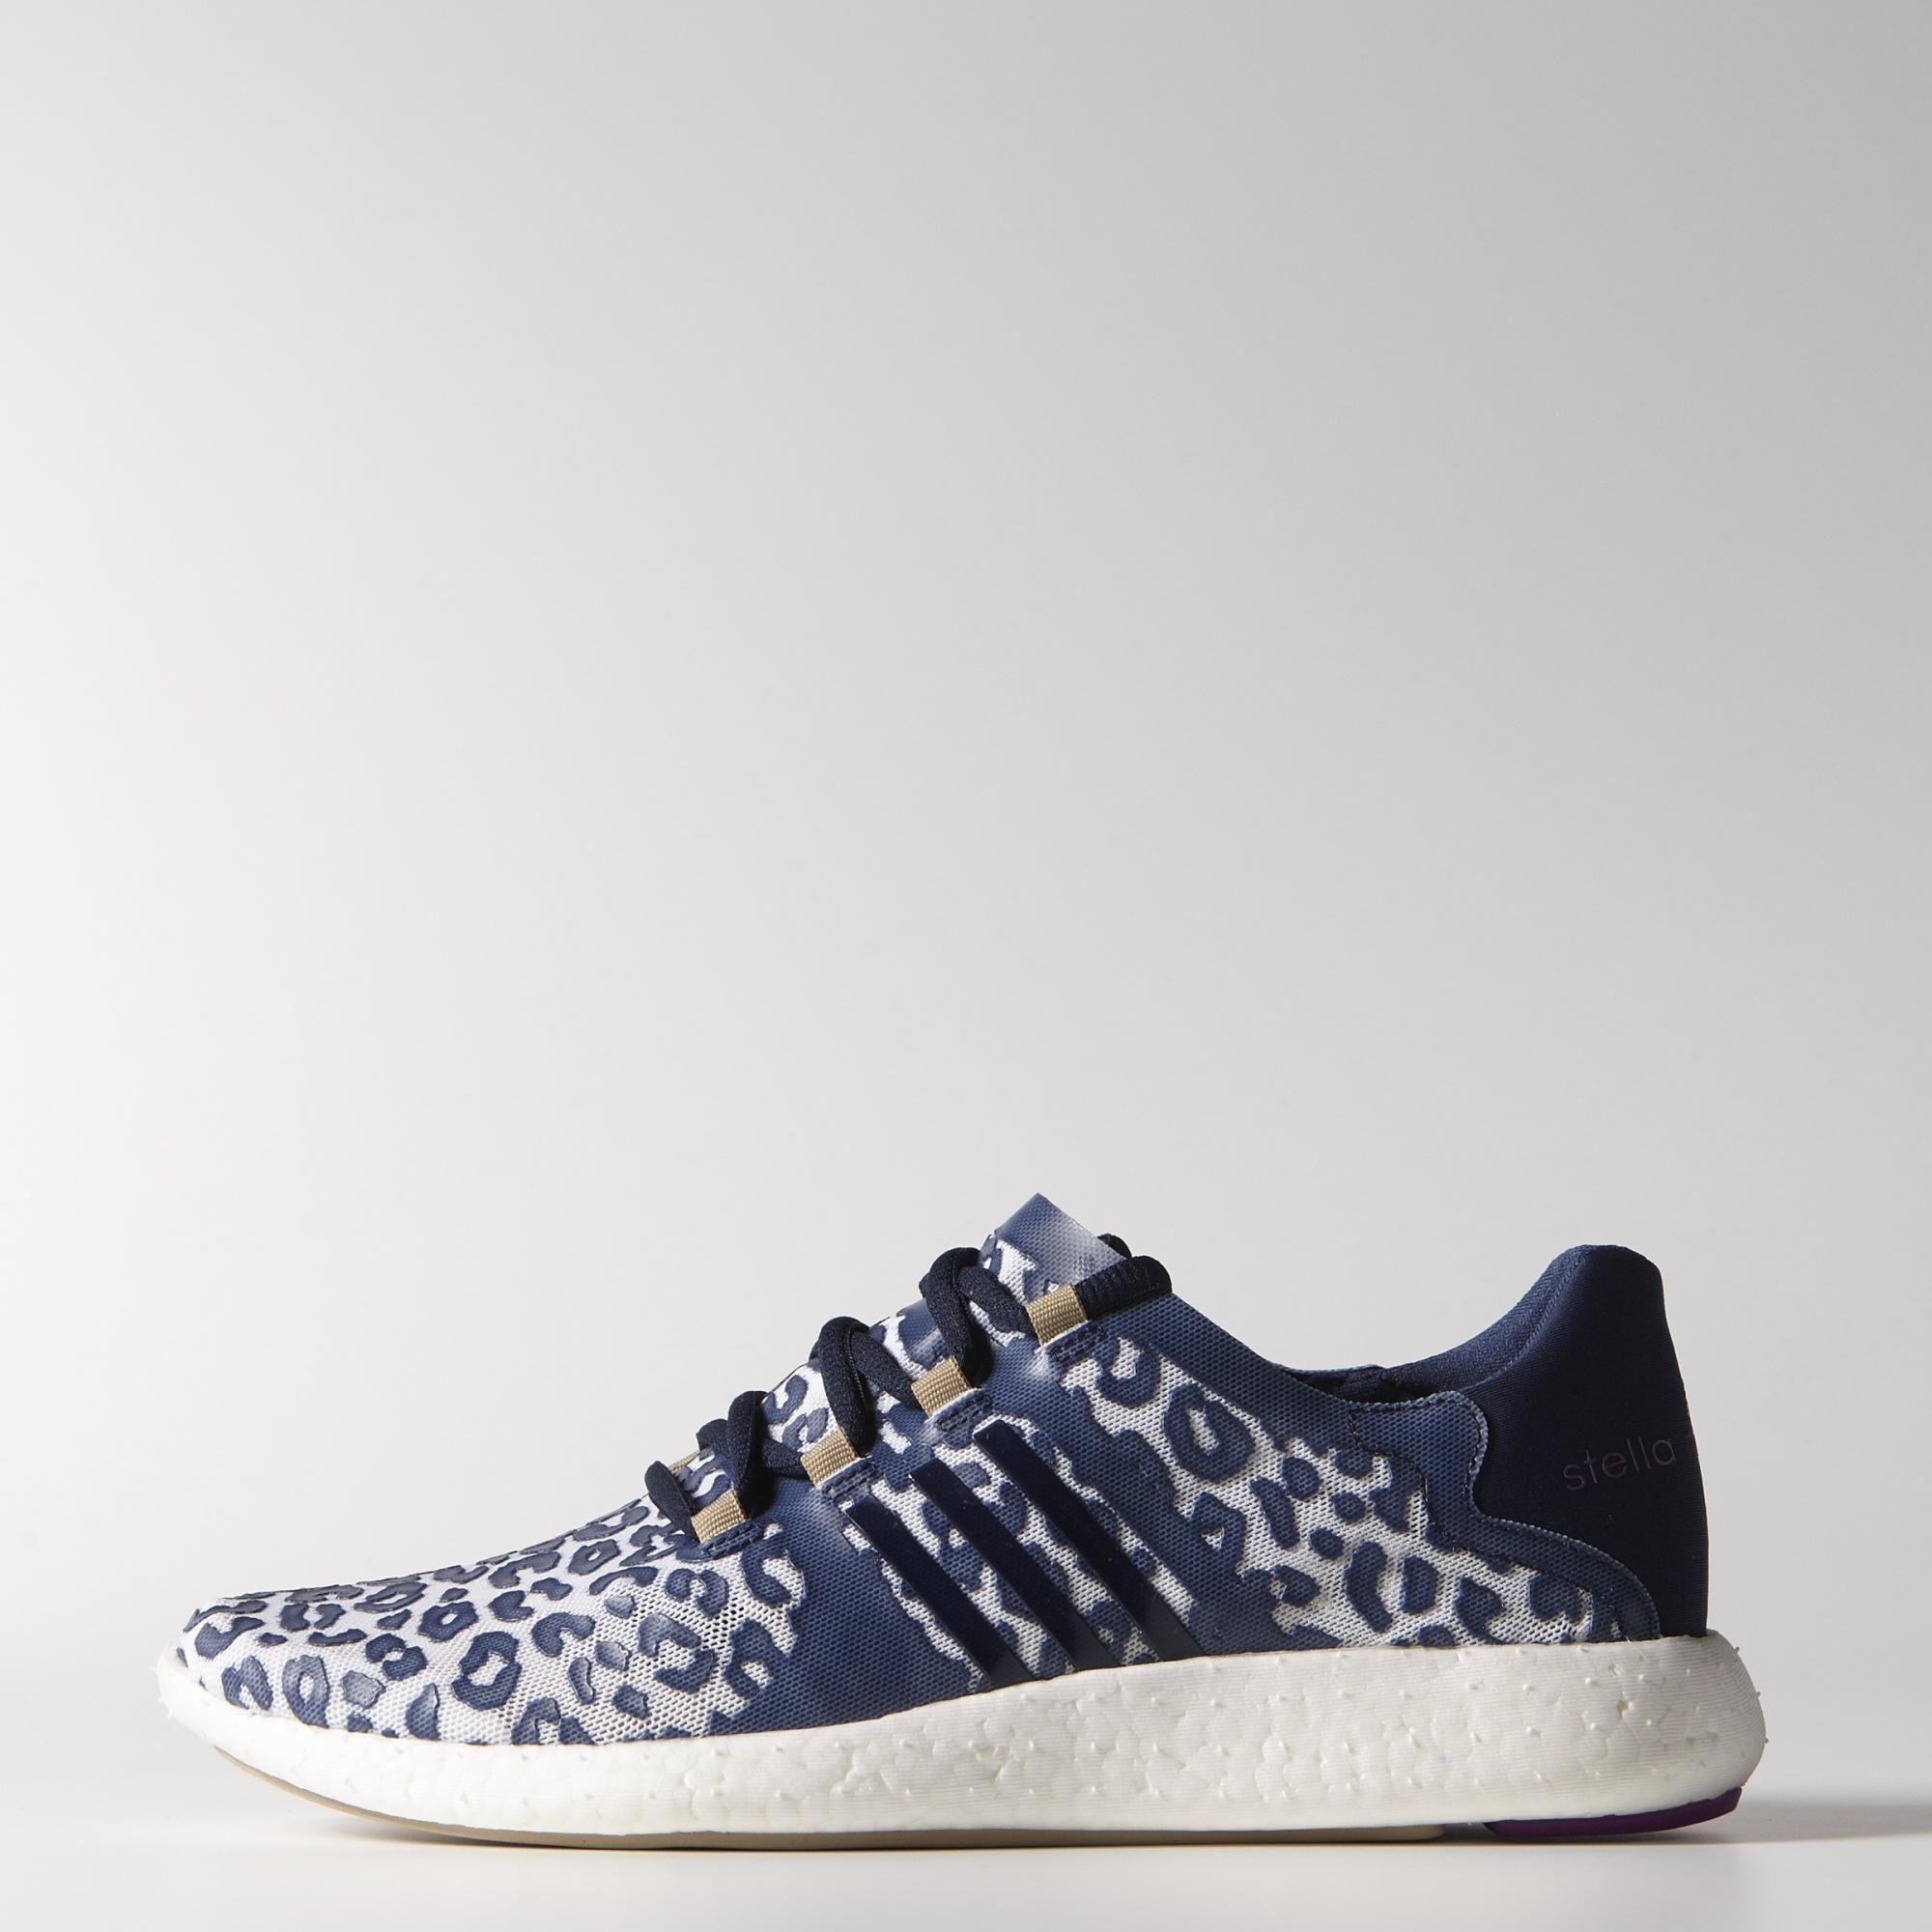 adidas Pureboost Shoes adidas UK Blauwe schoenen